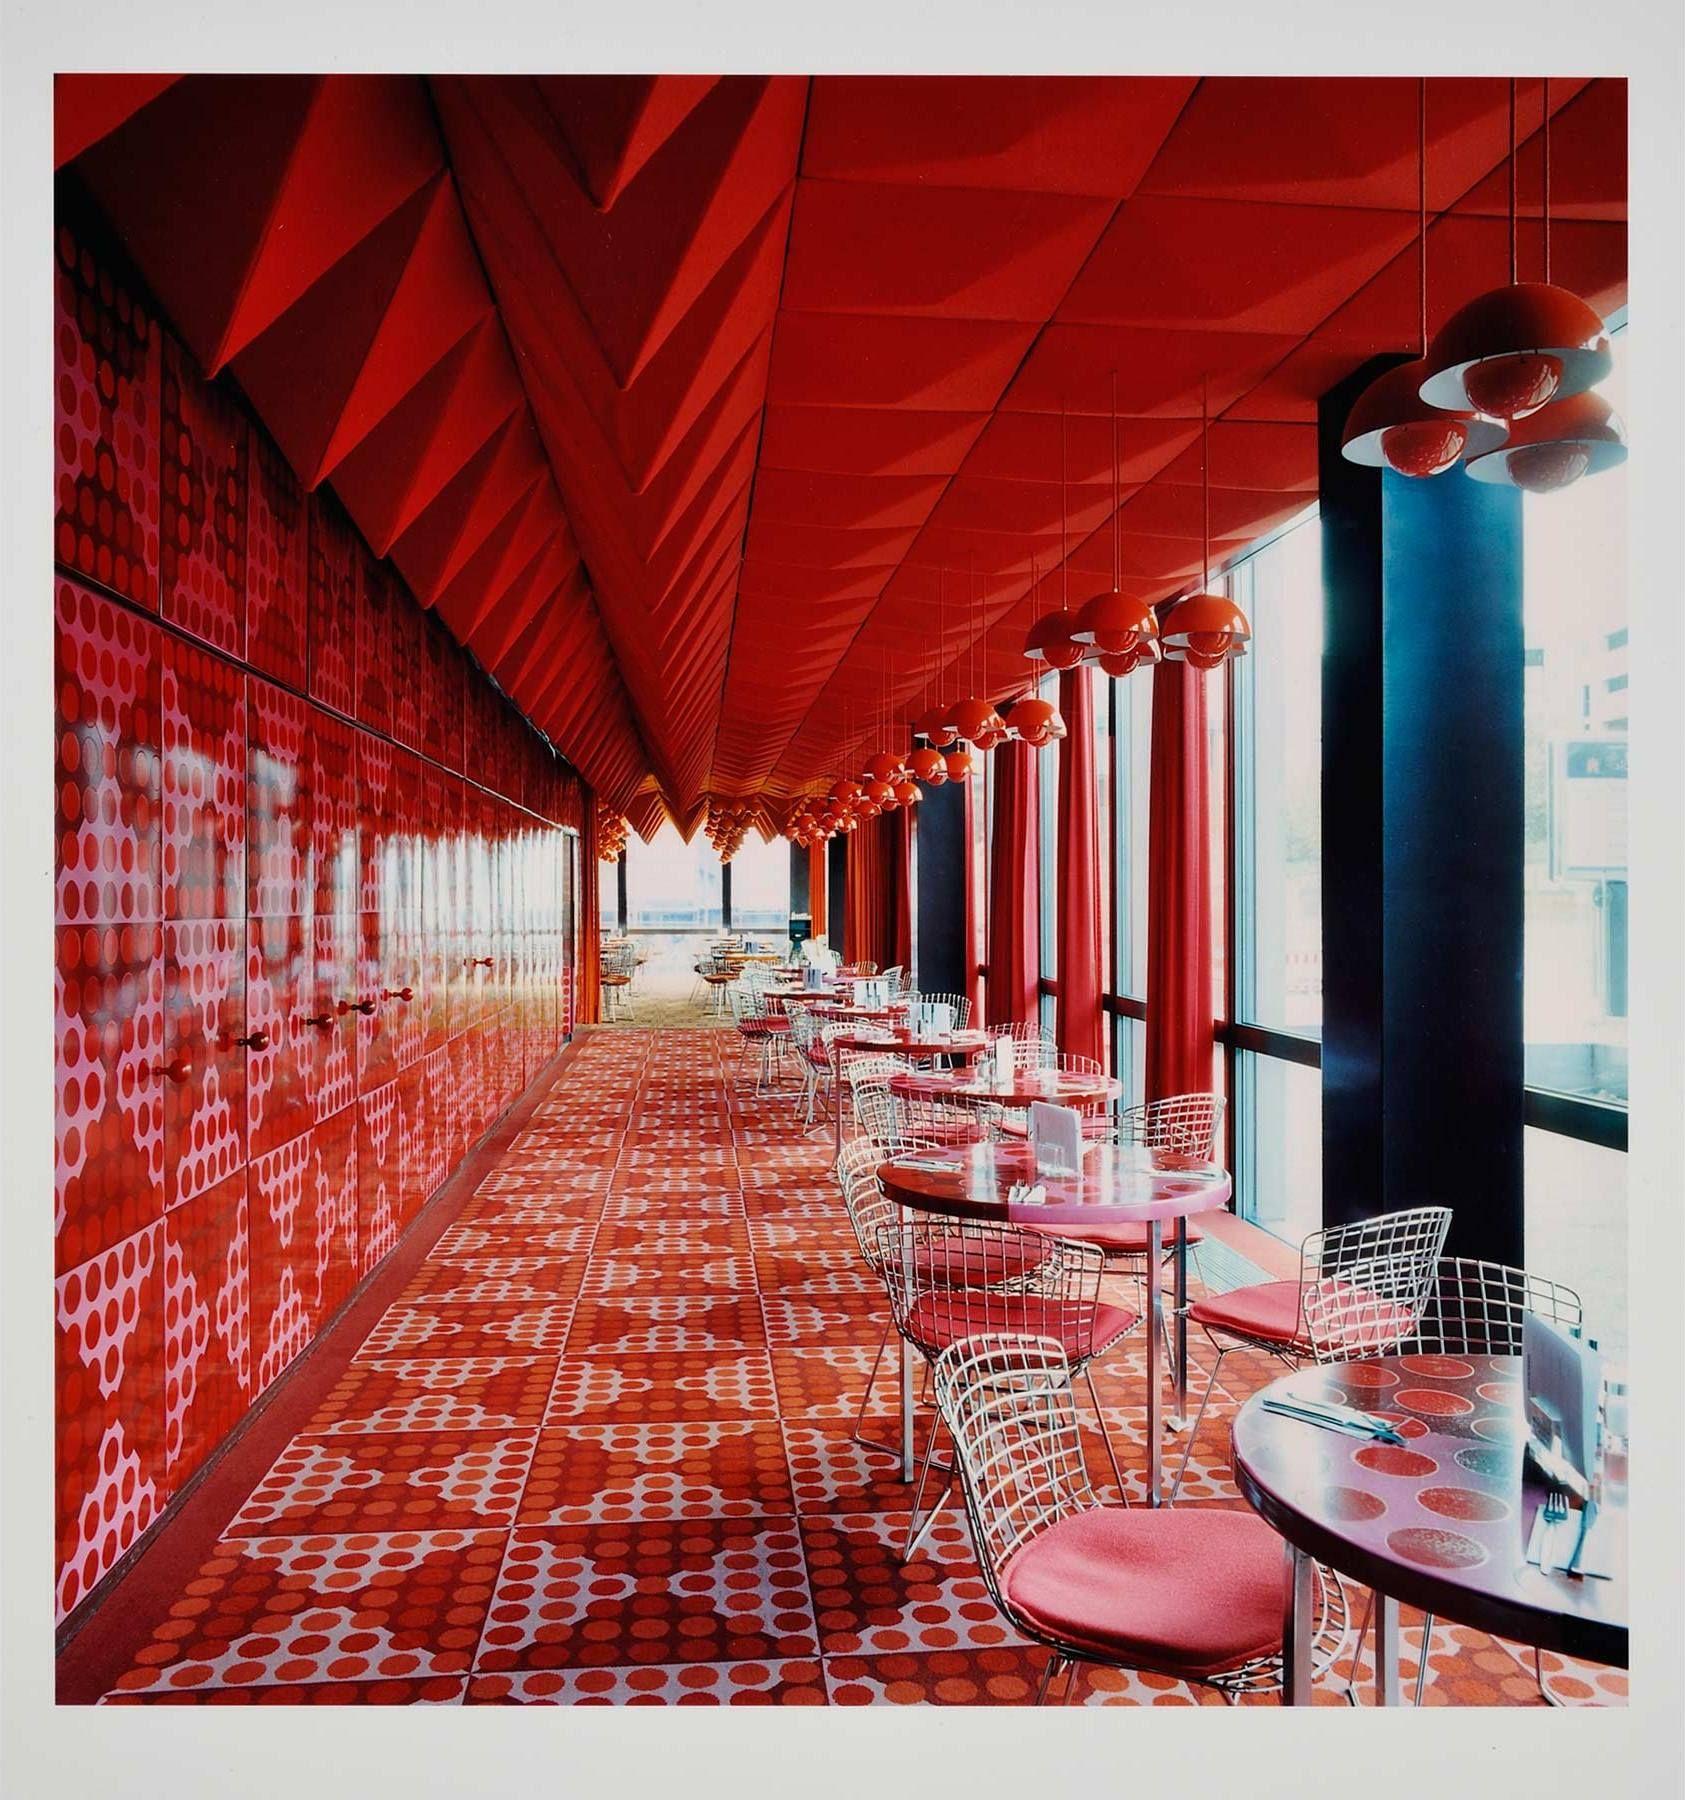 CANDIDA HOFER - SPIEGELKANTINE III - WENG CONTEMPORARY http://www.widewalls.ch/artwork/candida-hofer/spiegelkantine-iii/ #photography